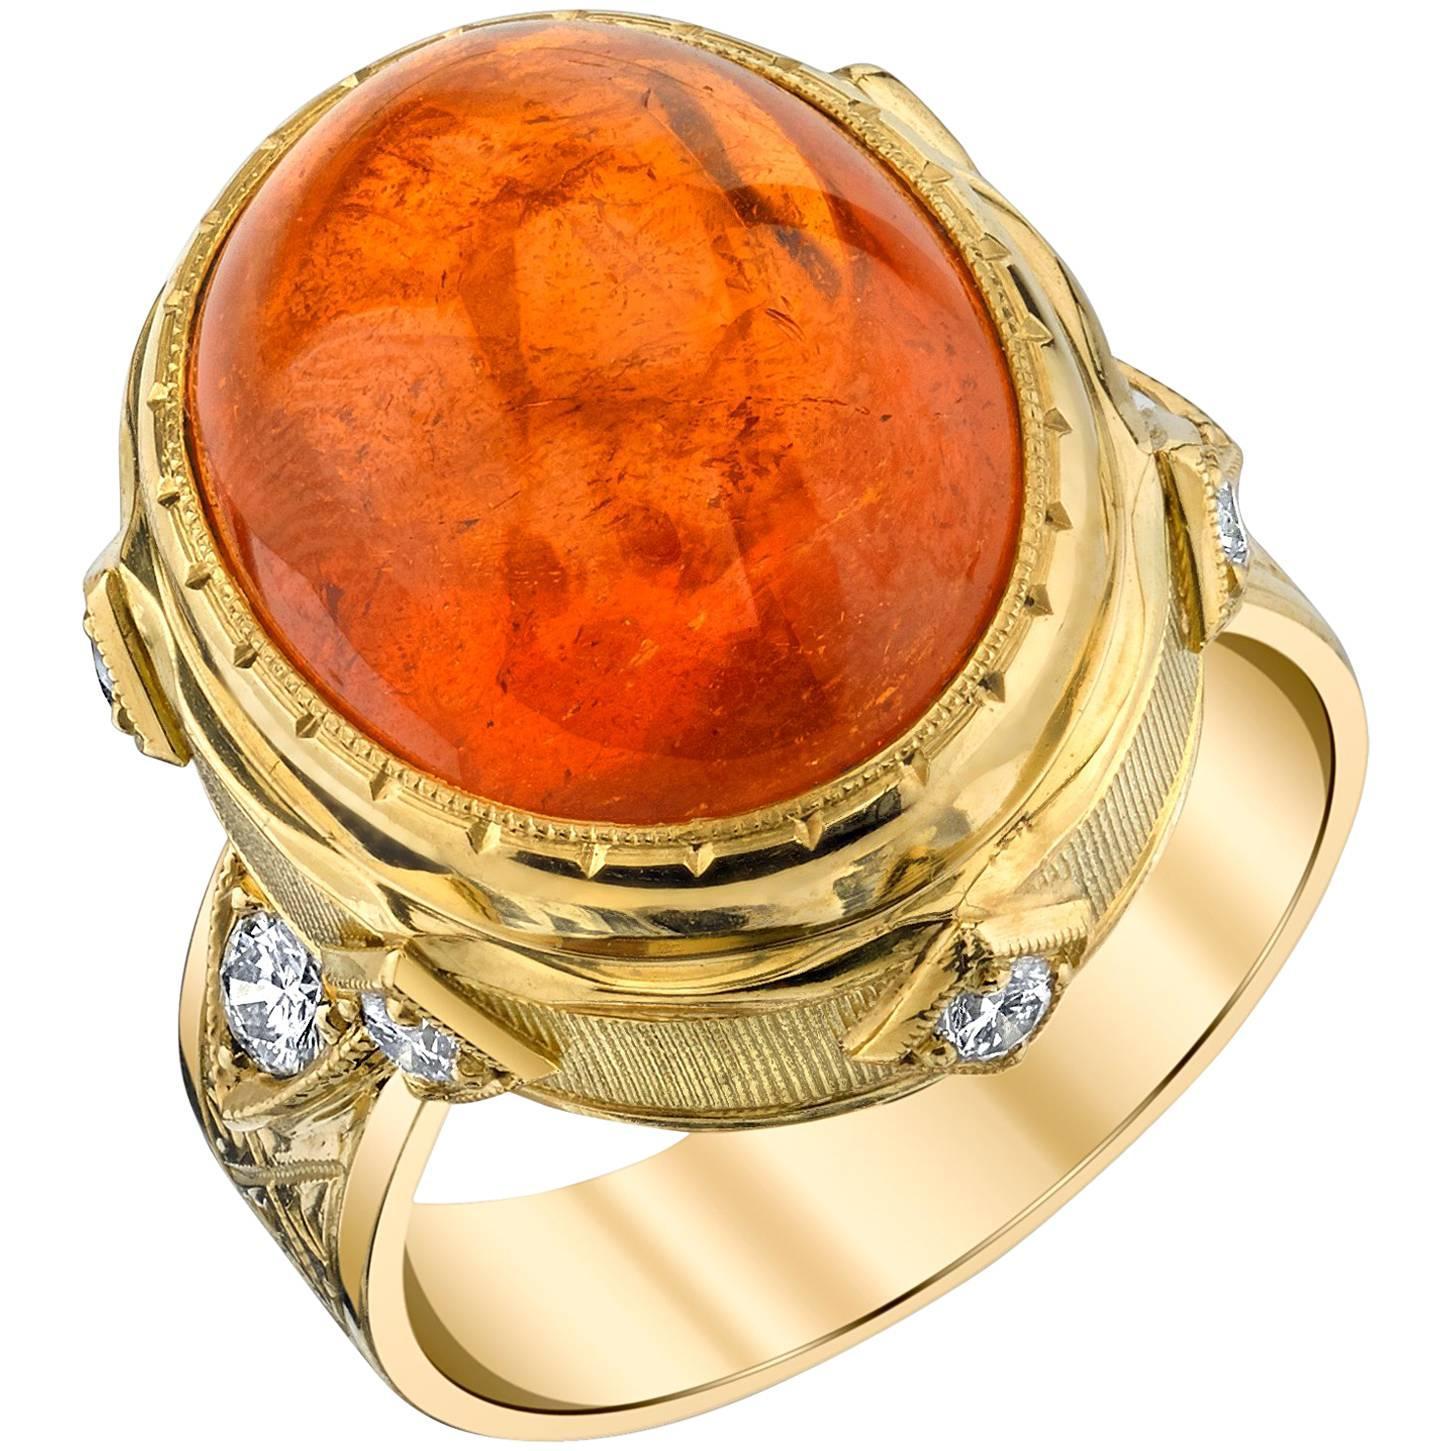 28.55 ct. Spessartite Garnet Cabochon, Diamond Yellow Gold Bezel Dome Ring